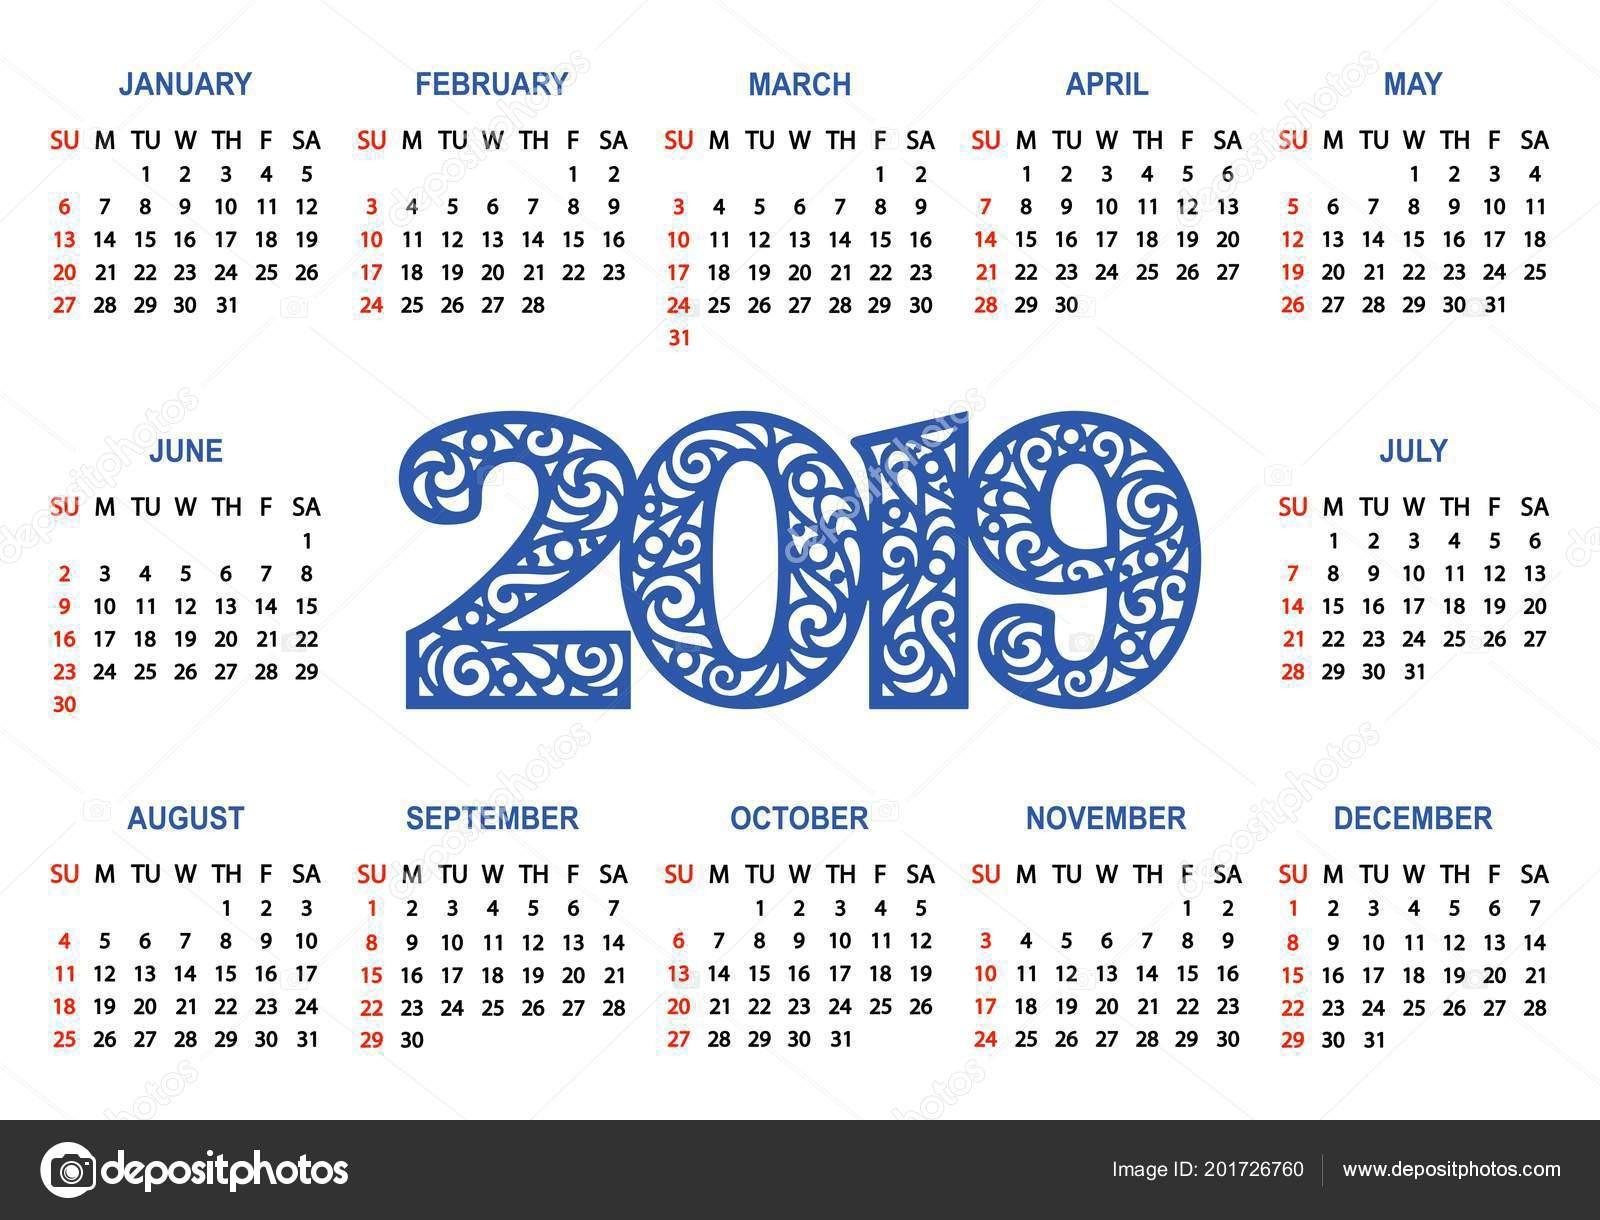 Calendario 2019 Con Festivos Usa Más Recientes Kalendář 2019 Blém Pozad T½den Začná Neděli Základn MřÅ¾ka